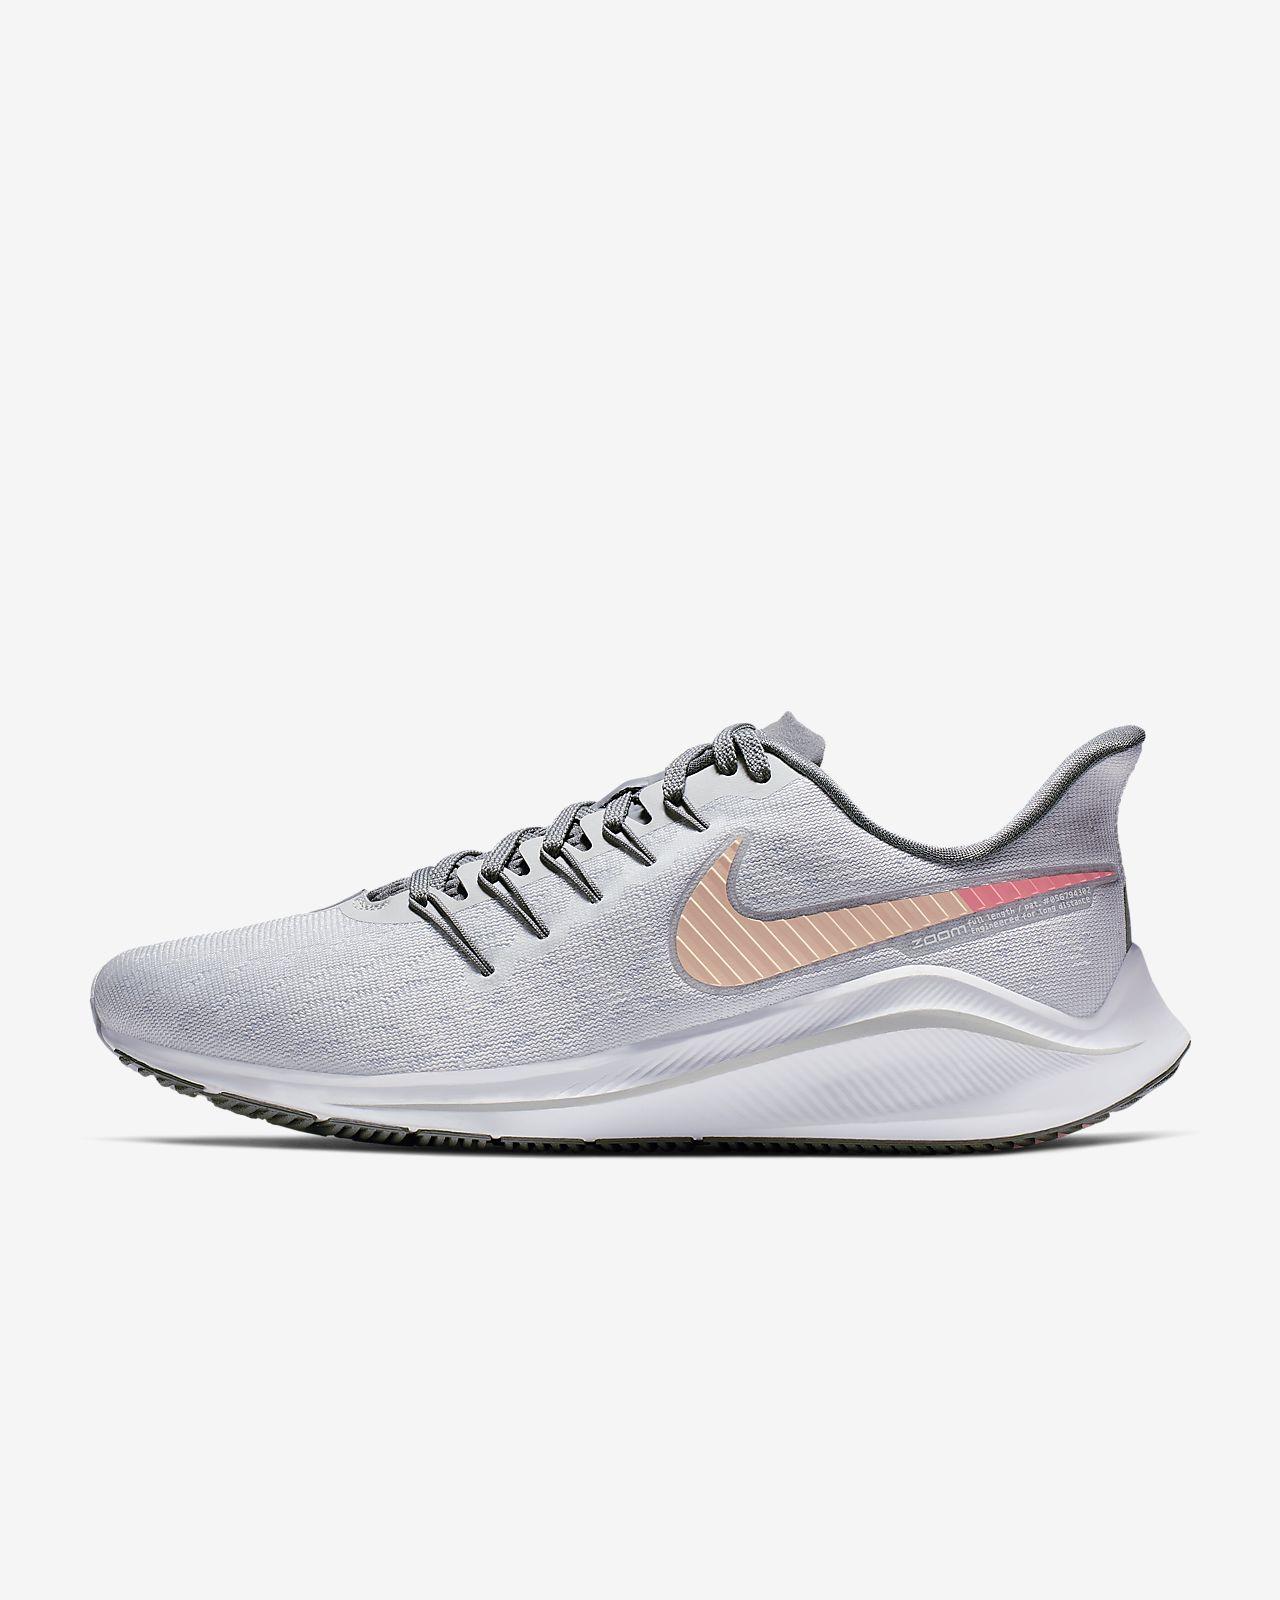 sports shoes b1e19 0a2ec ... Chaussure de running Nike Air Zoom Vomero 14 pour Femme